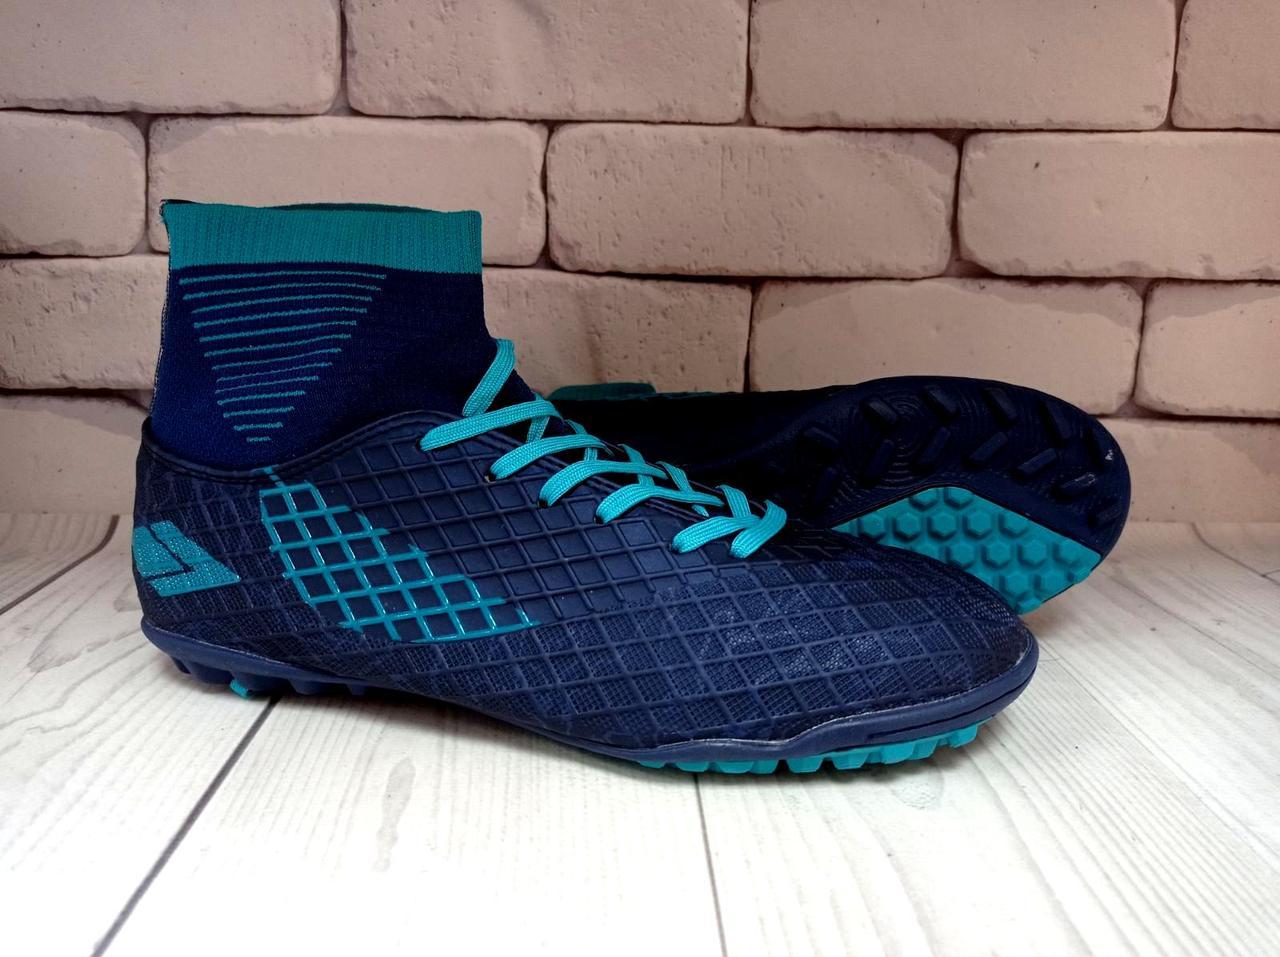 Cороконожки с носком футбольные синие KMB Bry ant 36-41р